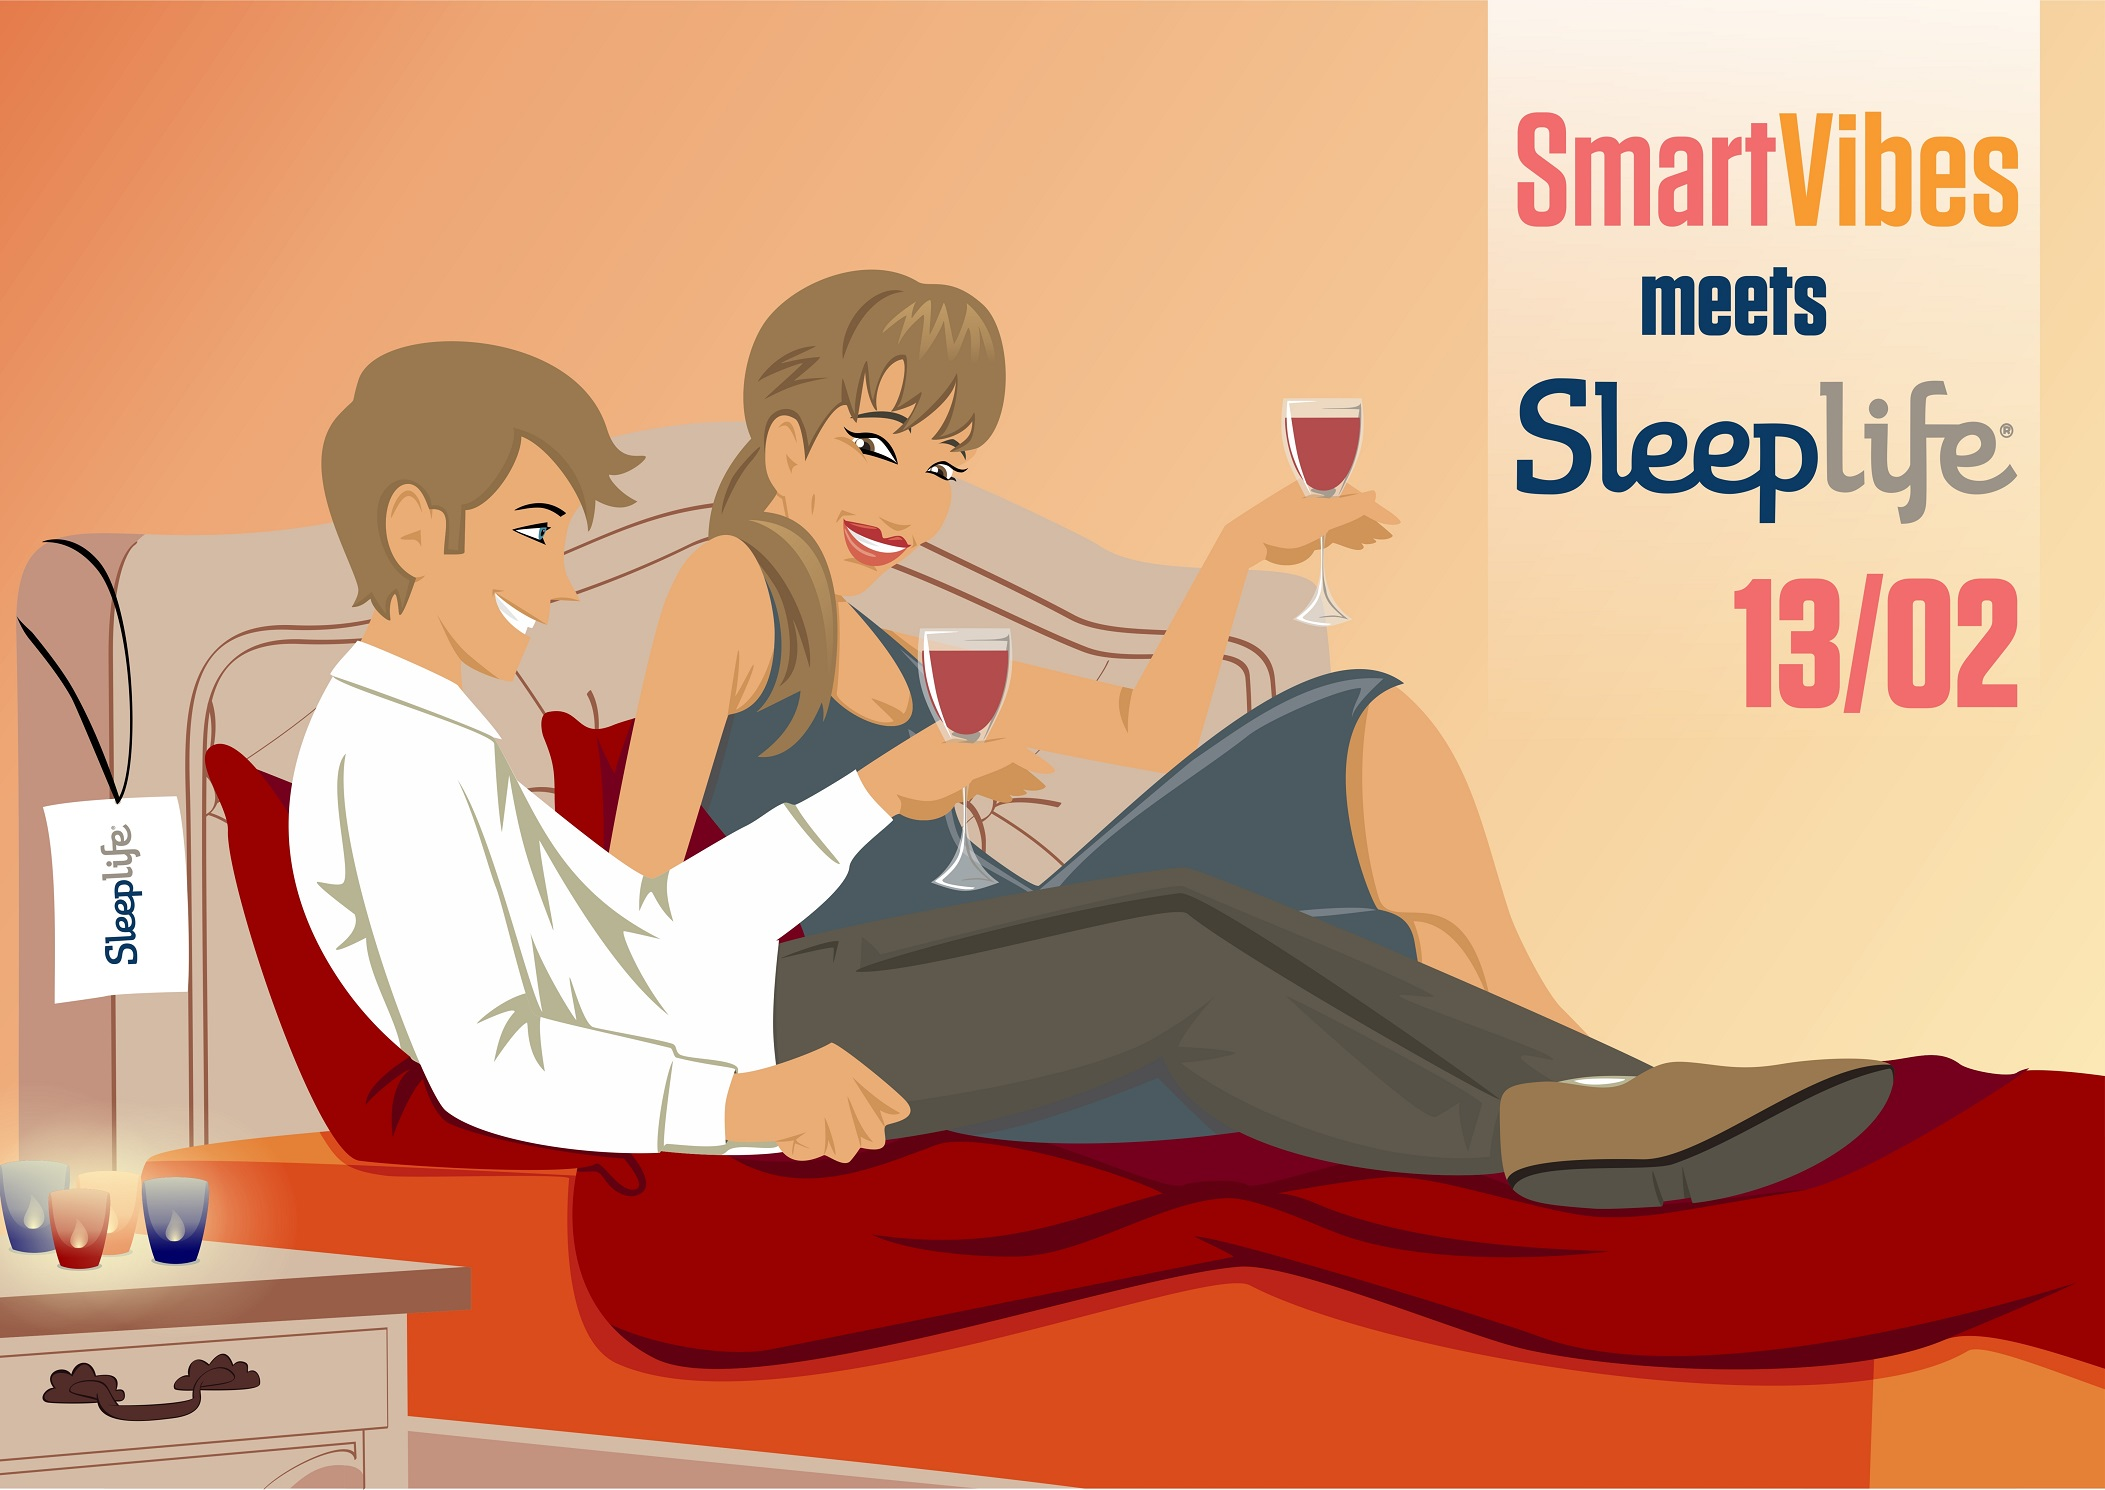 smartvibes dating site